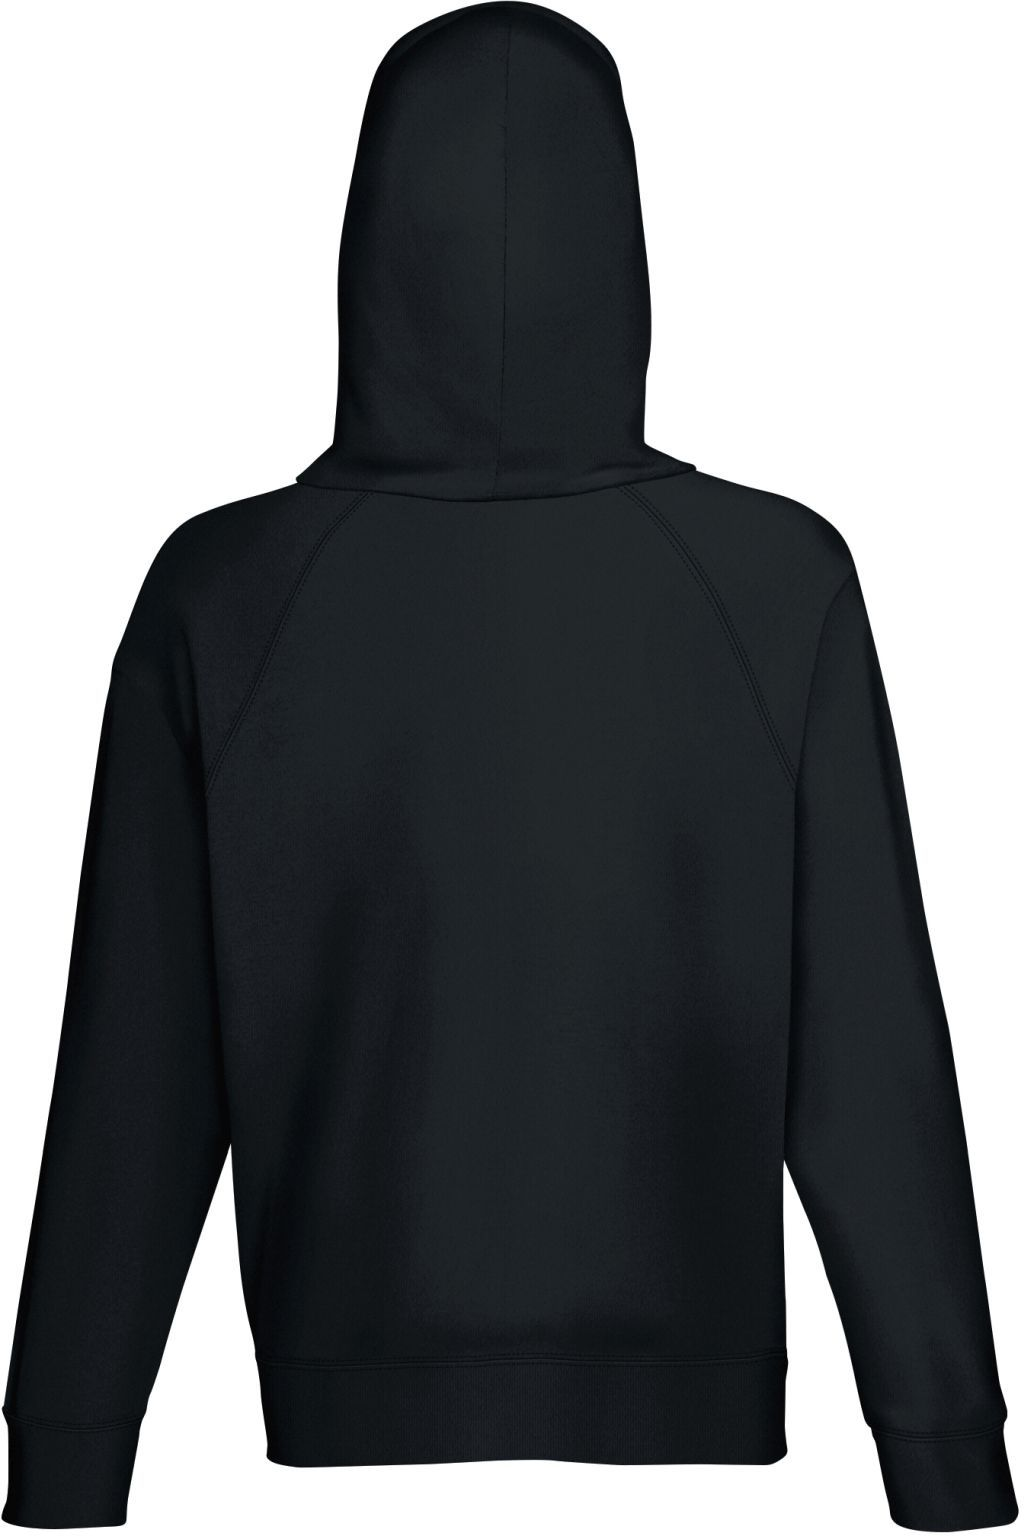 e83358b2371f Bluza męska rozpinana z kapturem Lightweight Czarna XL    Fruit Of ...